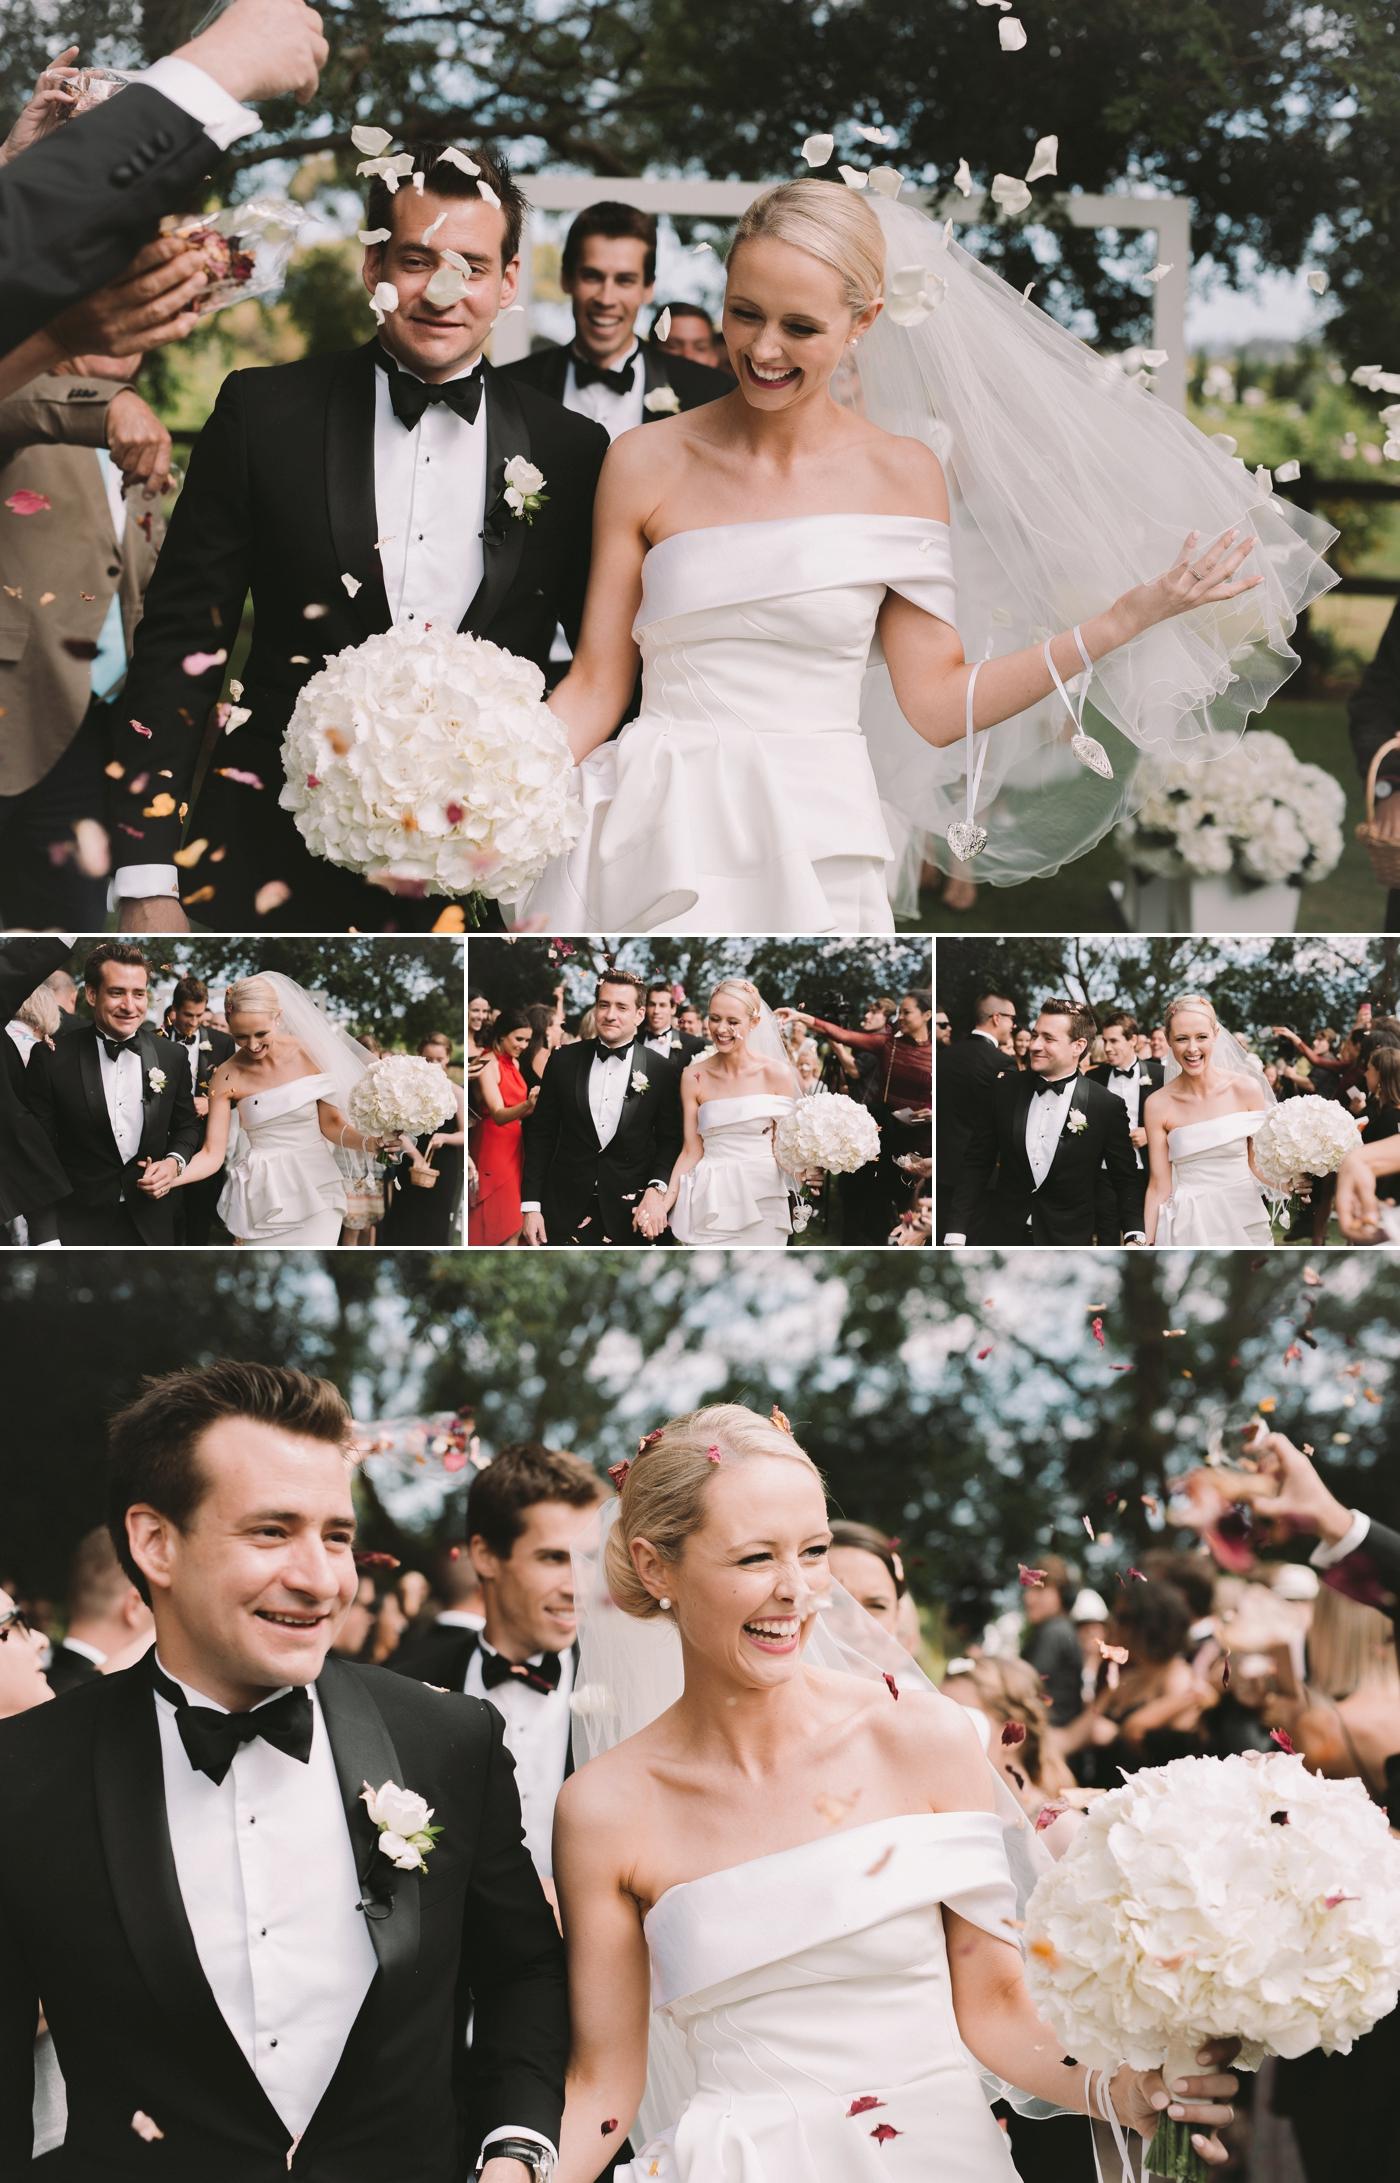 Bec and Brad - Waverley Estate Wedding - Natural wedding photographer in Adelaide